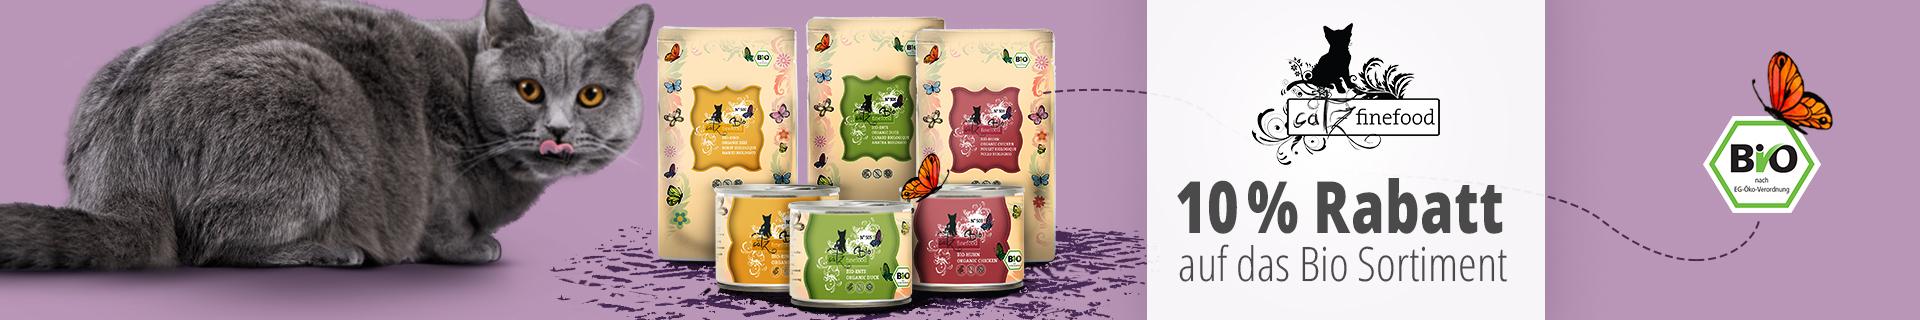 Catz Finefood 10% Rabatt auf Bio Produkte